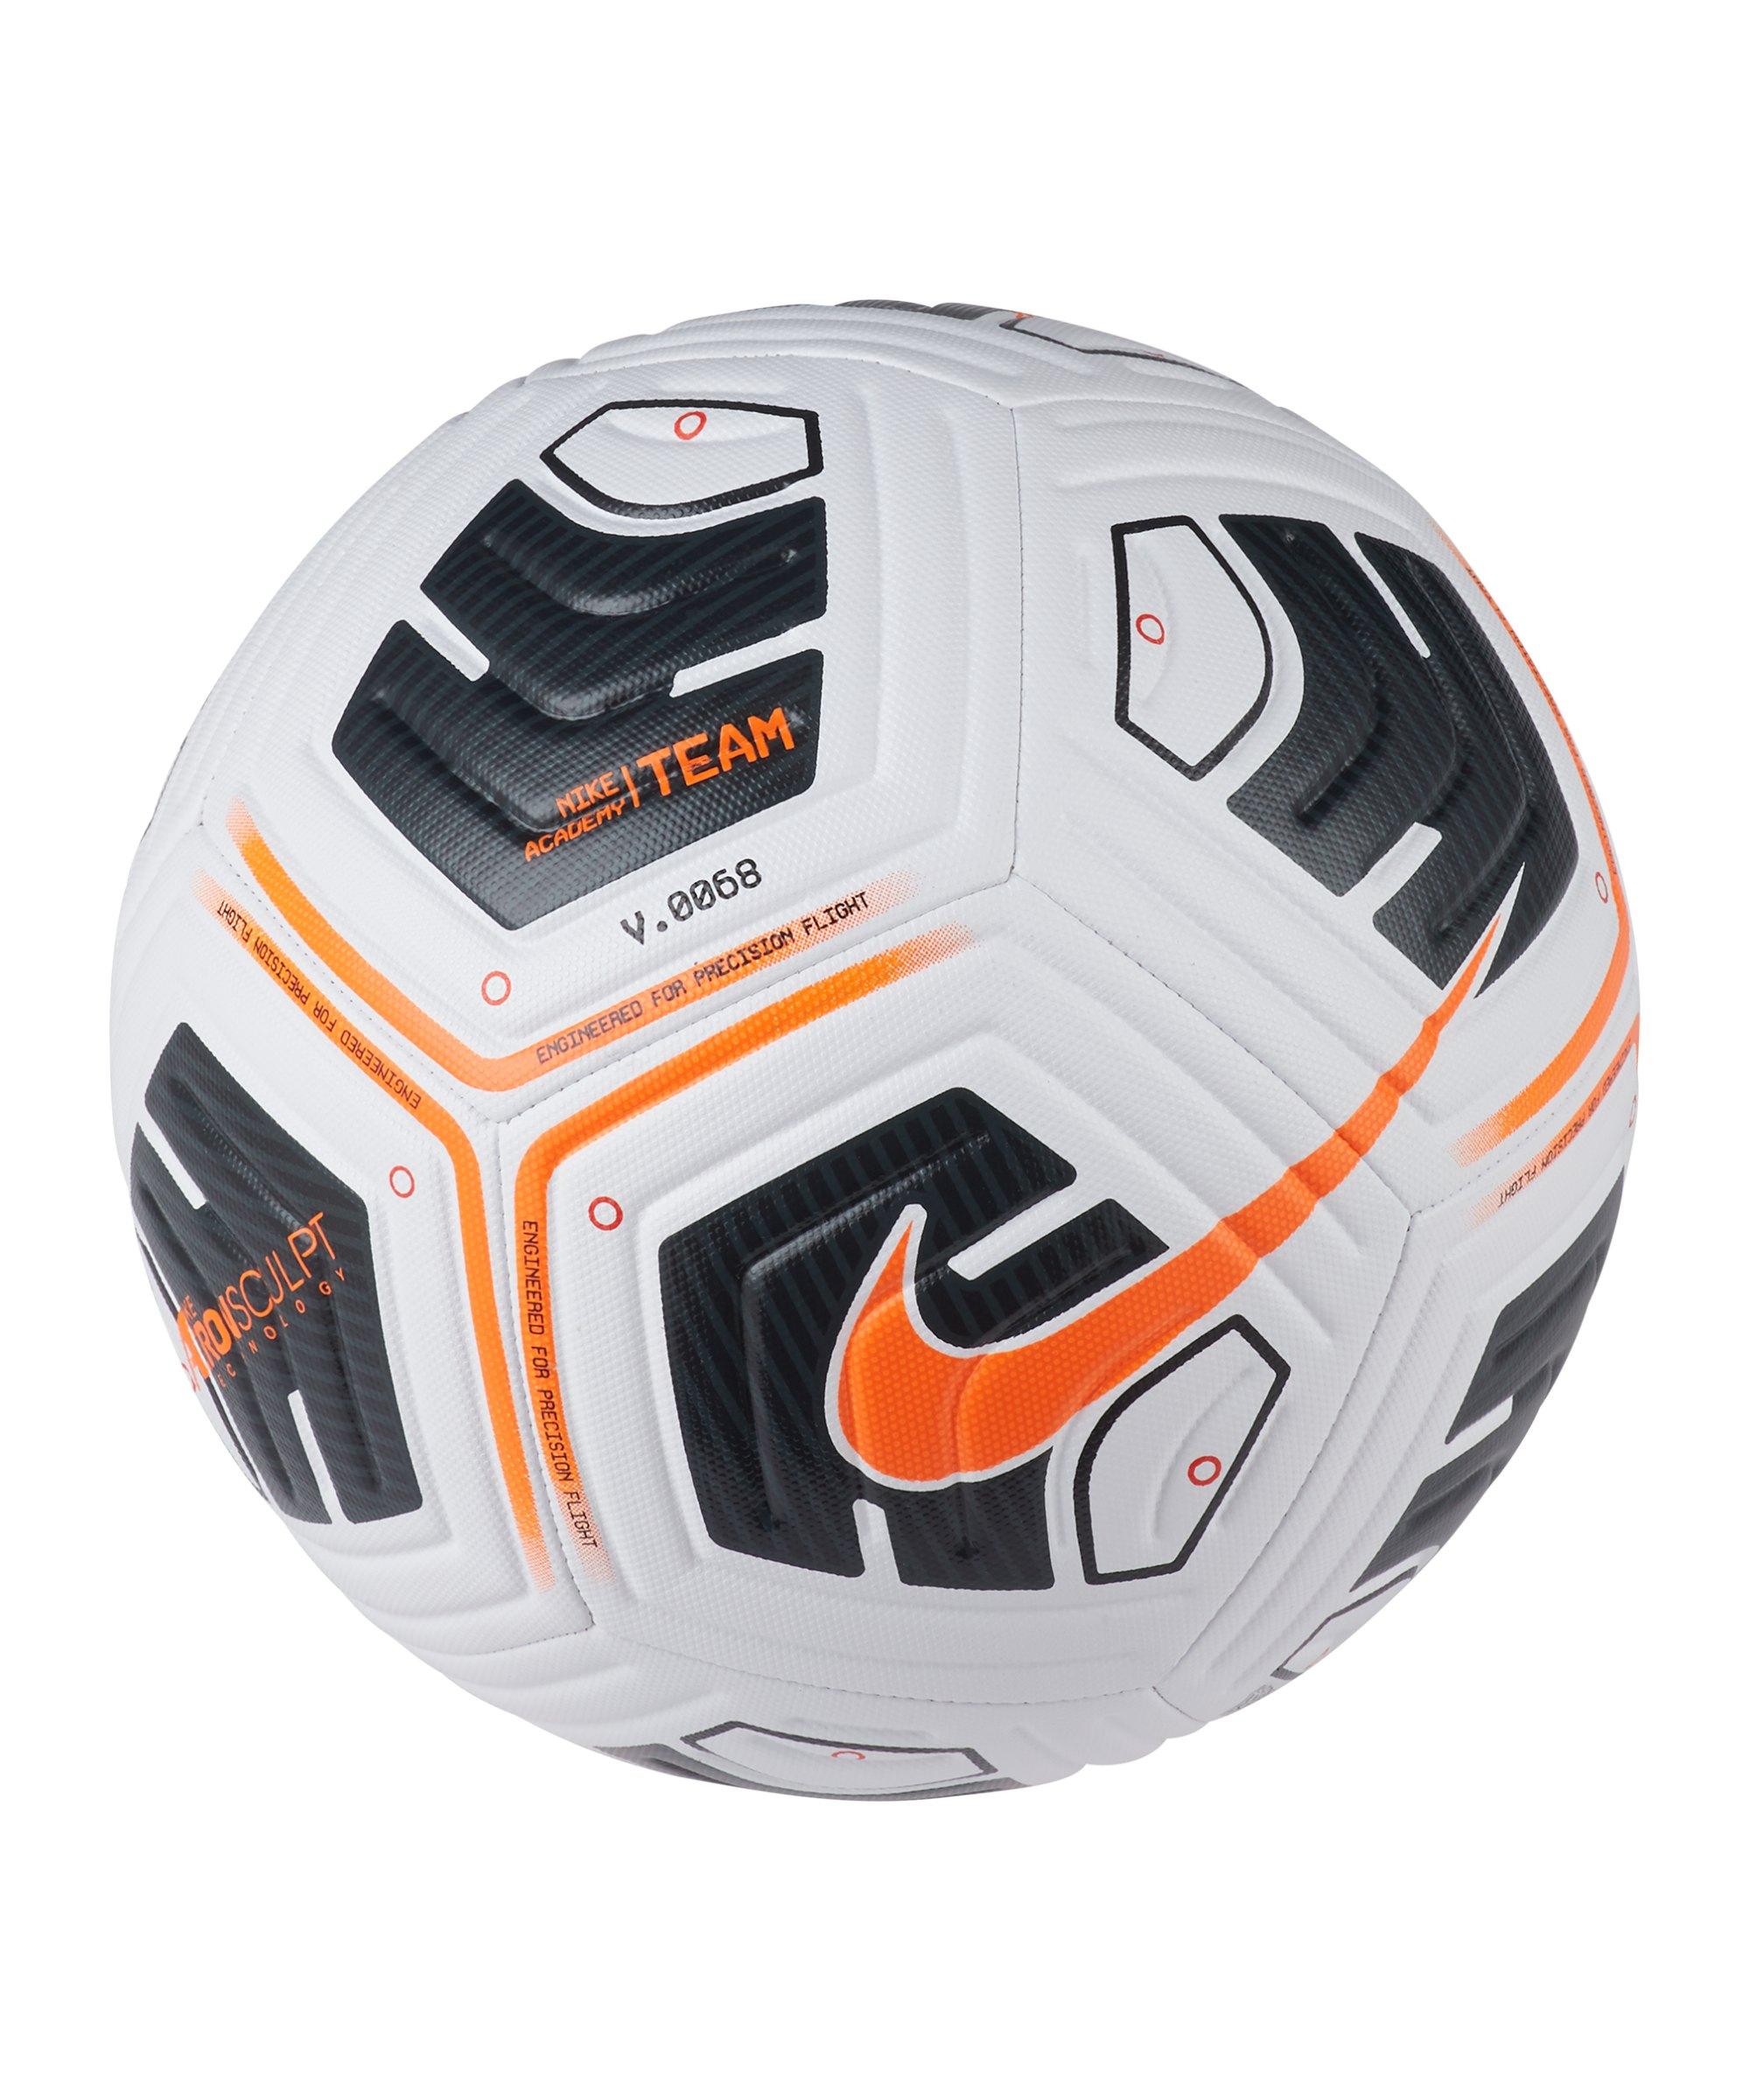 Nike Academy Team Trainingsball Weiss Orange F101 - weiss